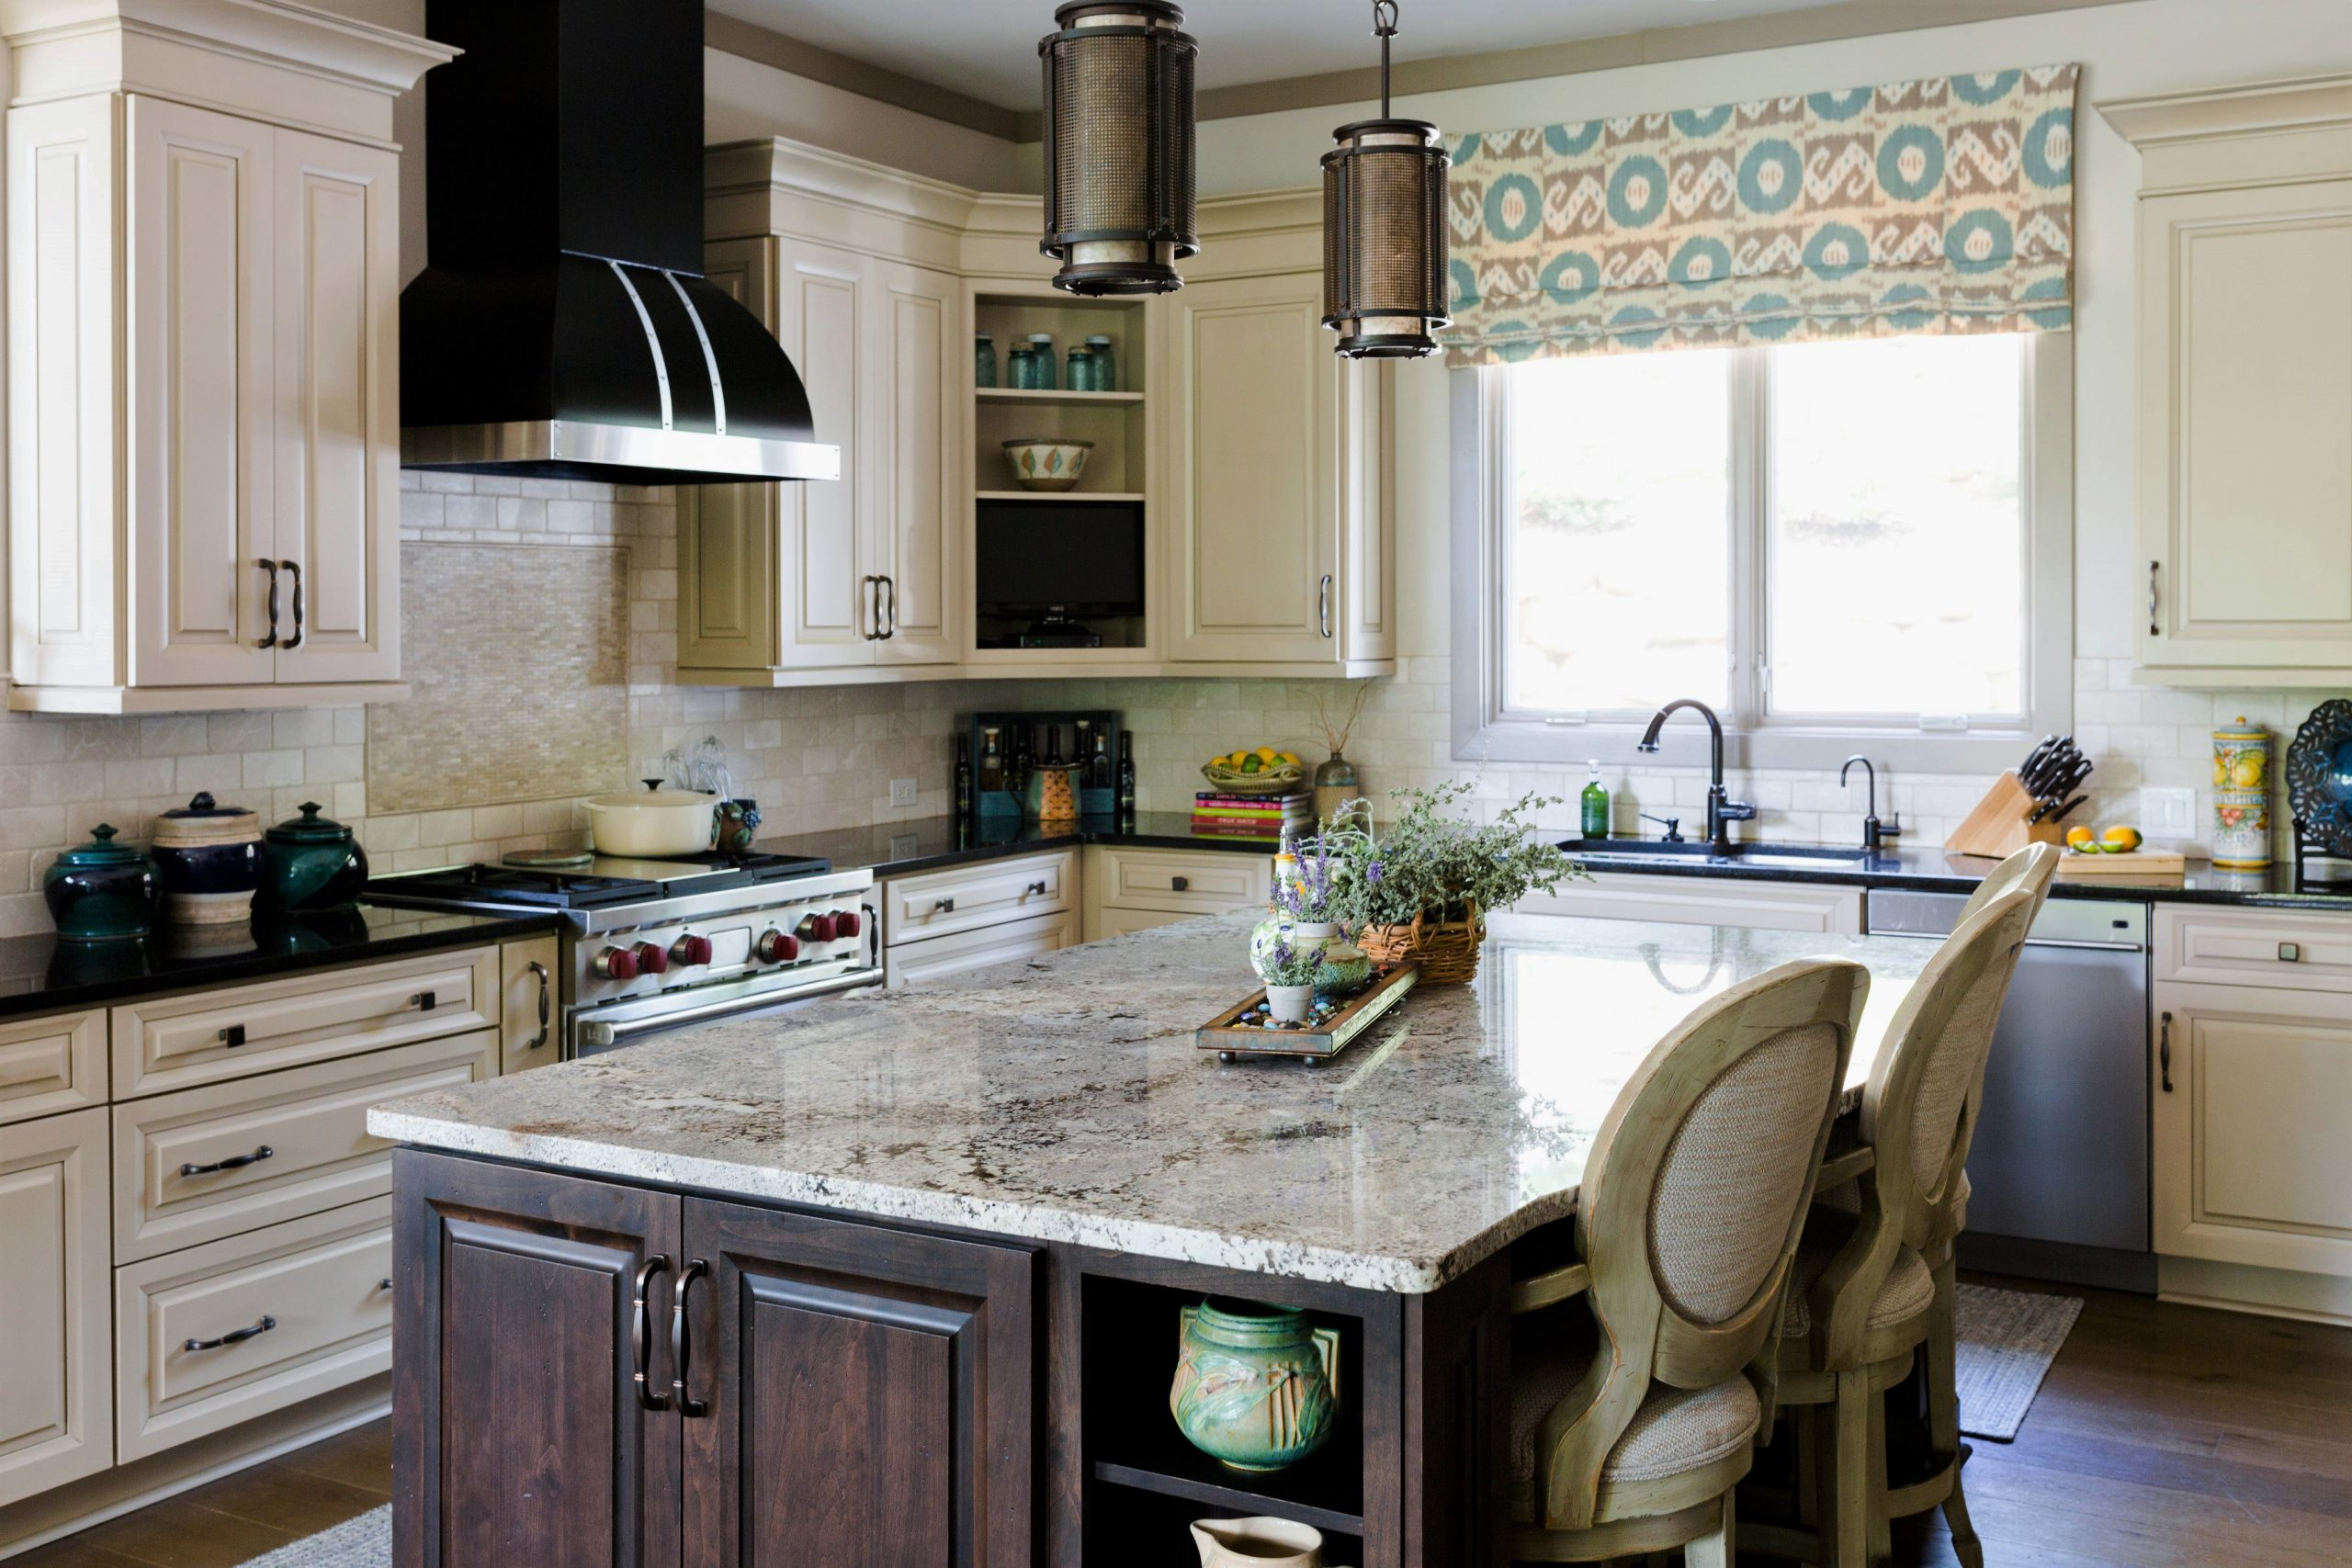 Destefano kitchen recolored 2